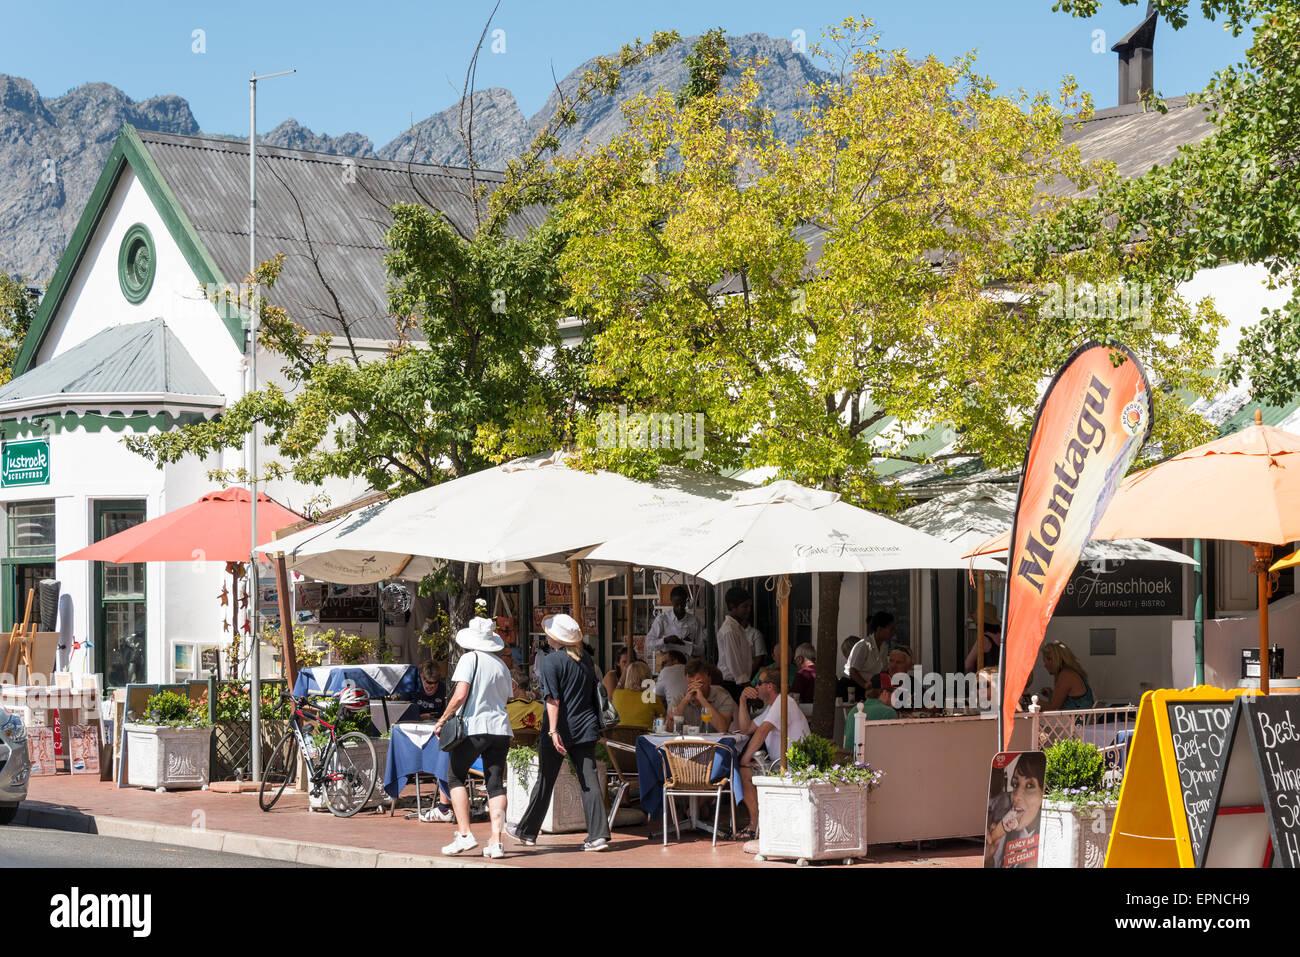 Cafe Franschhoek Bistro, Huguenot Road, Franschhoek, Cape Winelands District, Western Cape Province, Republic of - Stock Image